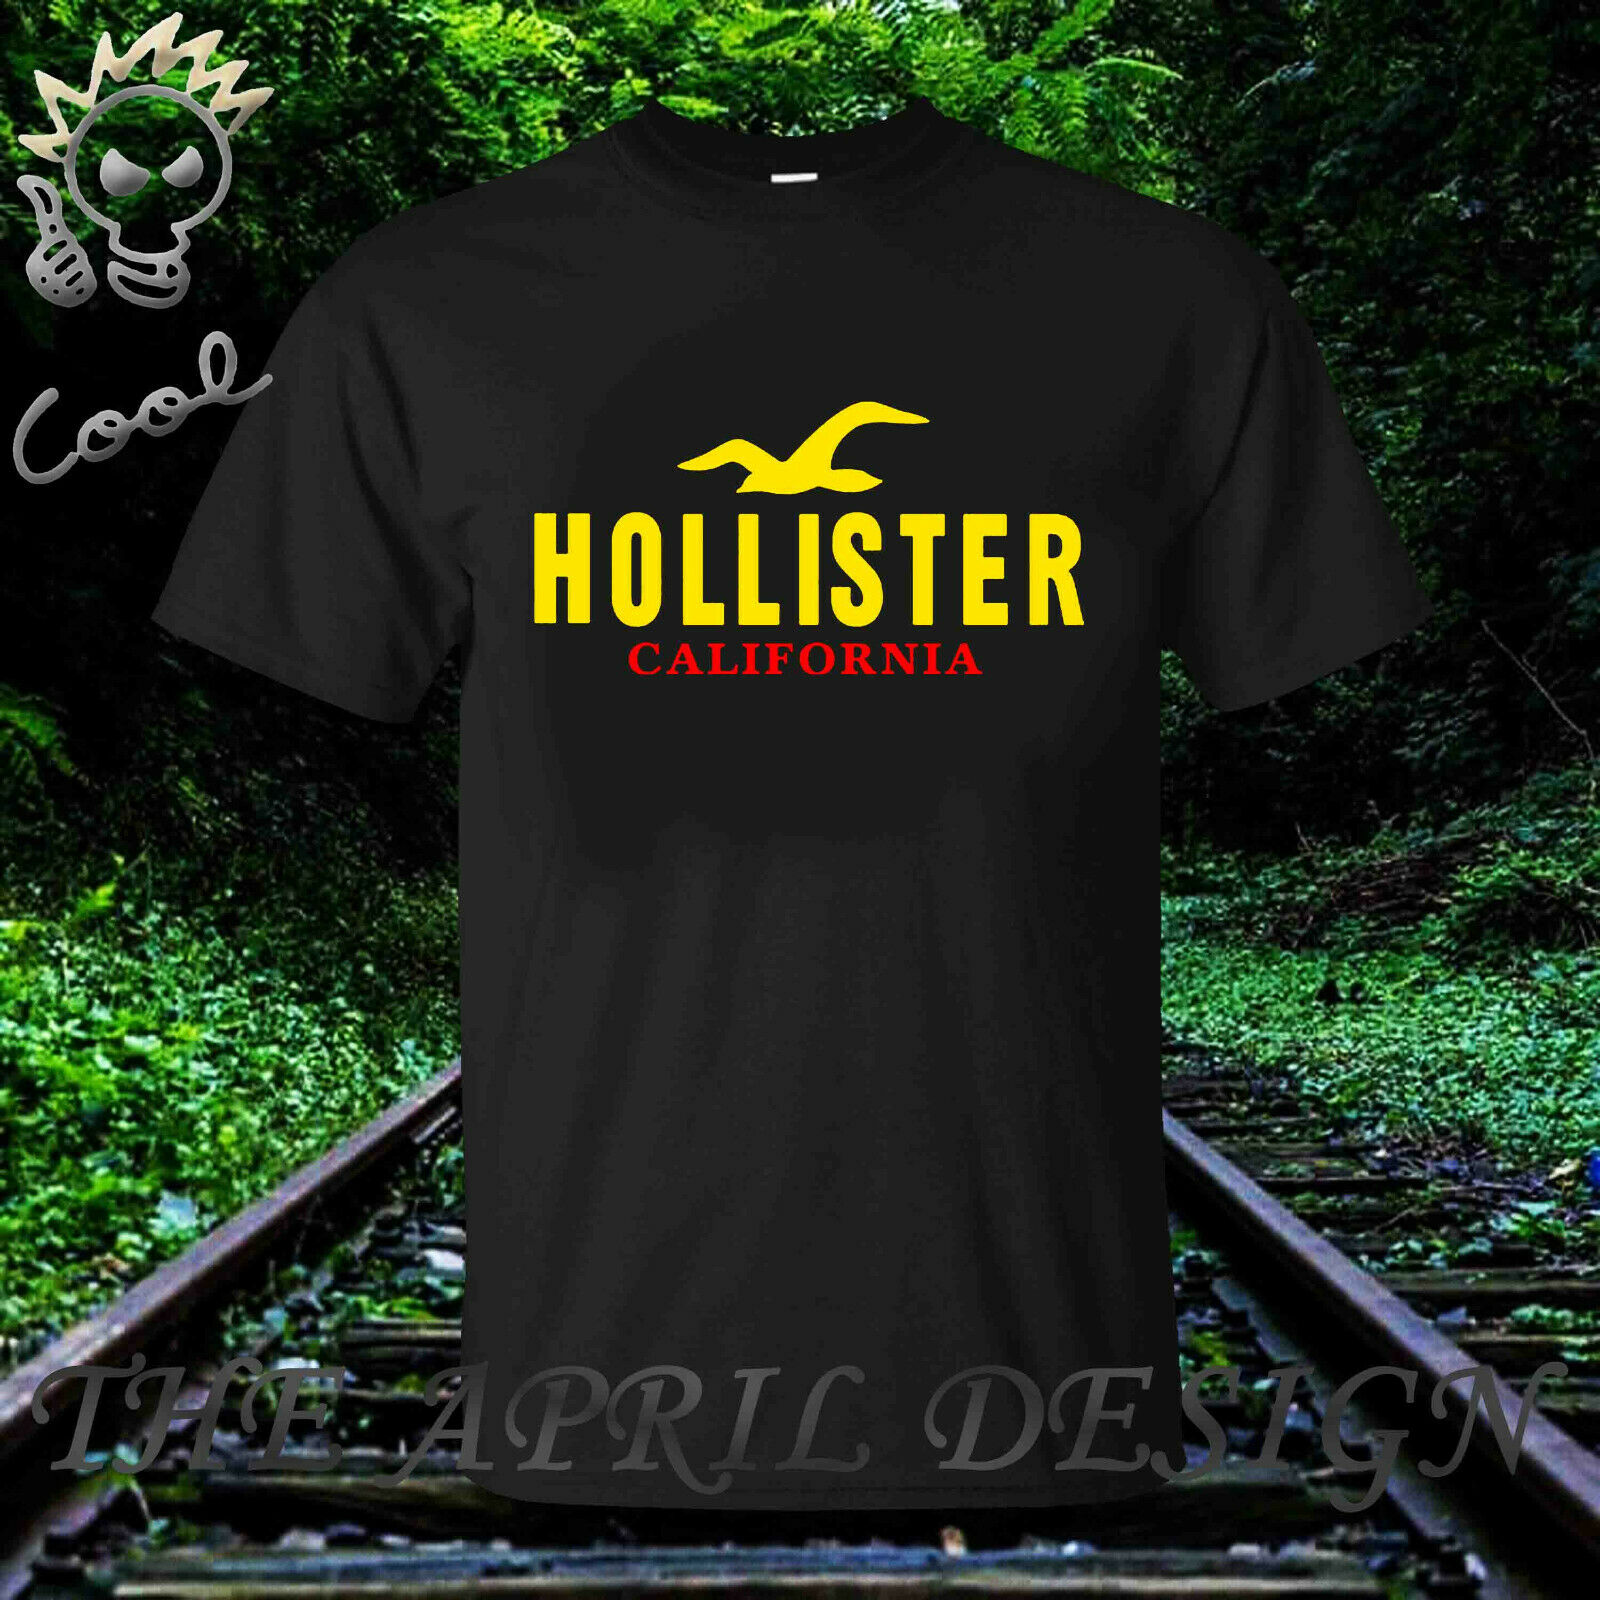 Limitado nuevo HOLISTER CALIFORNIA LOGO hombres camiseta elegir color